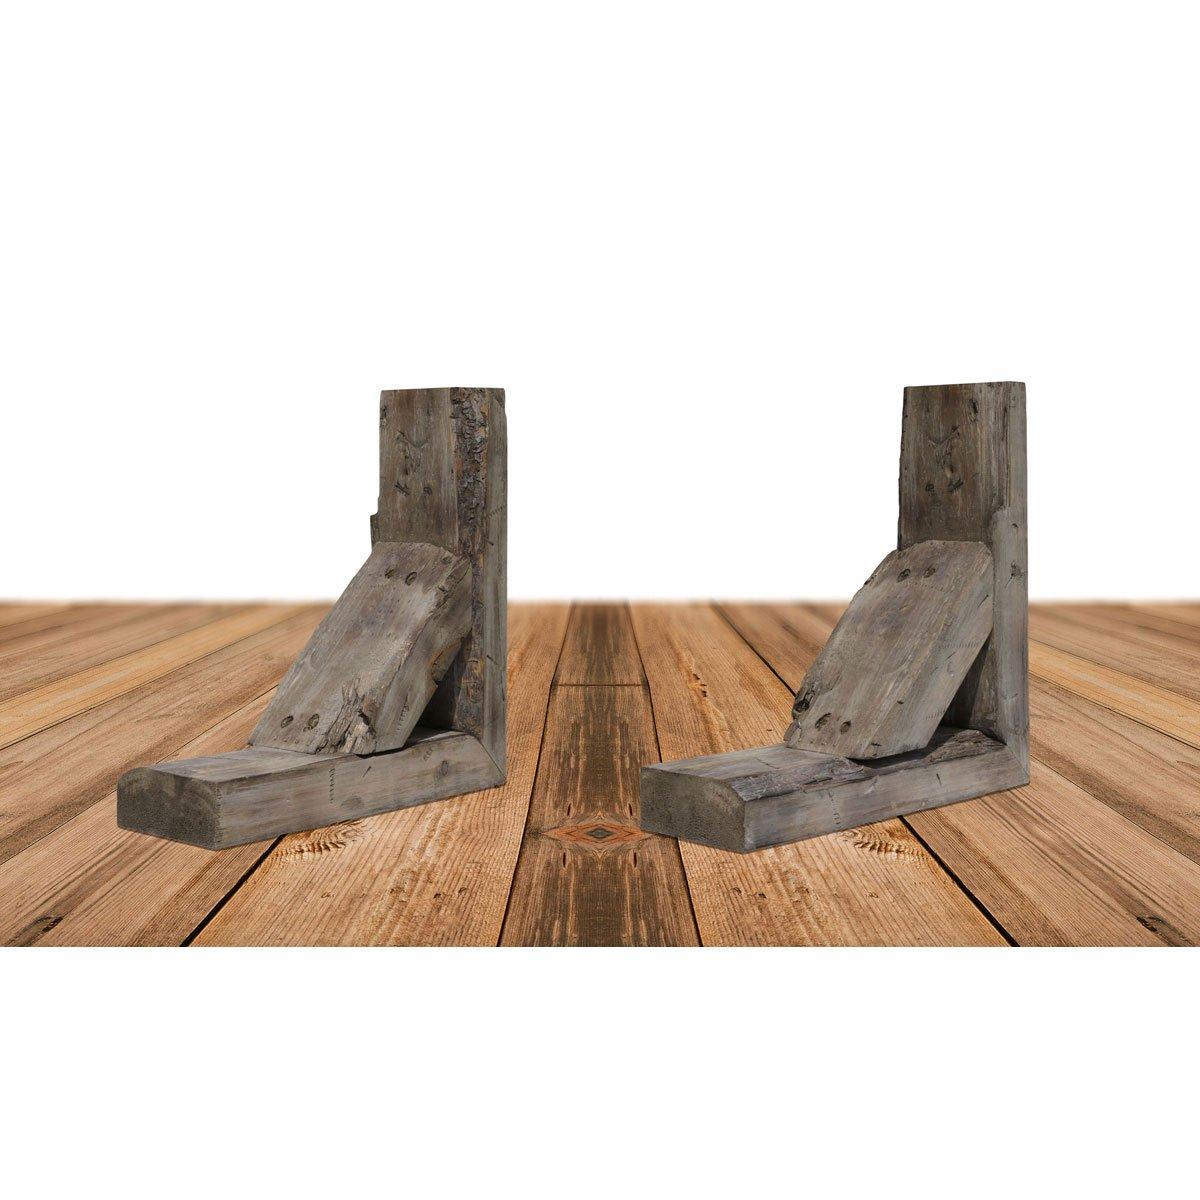 Ekena Millwork BKTB03X08X08TRPG-CASE-2 Wood Bracket, 3 1/2'' W D x 8'' H, Pebble Grey